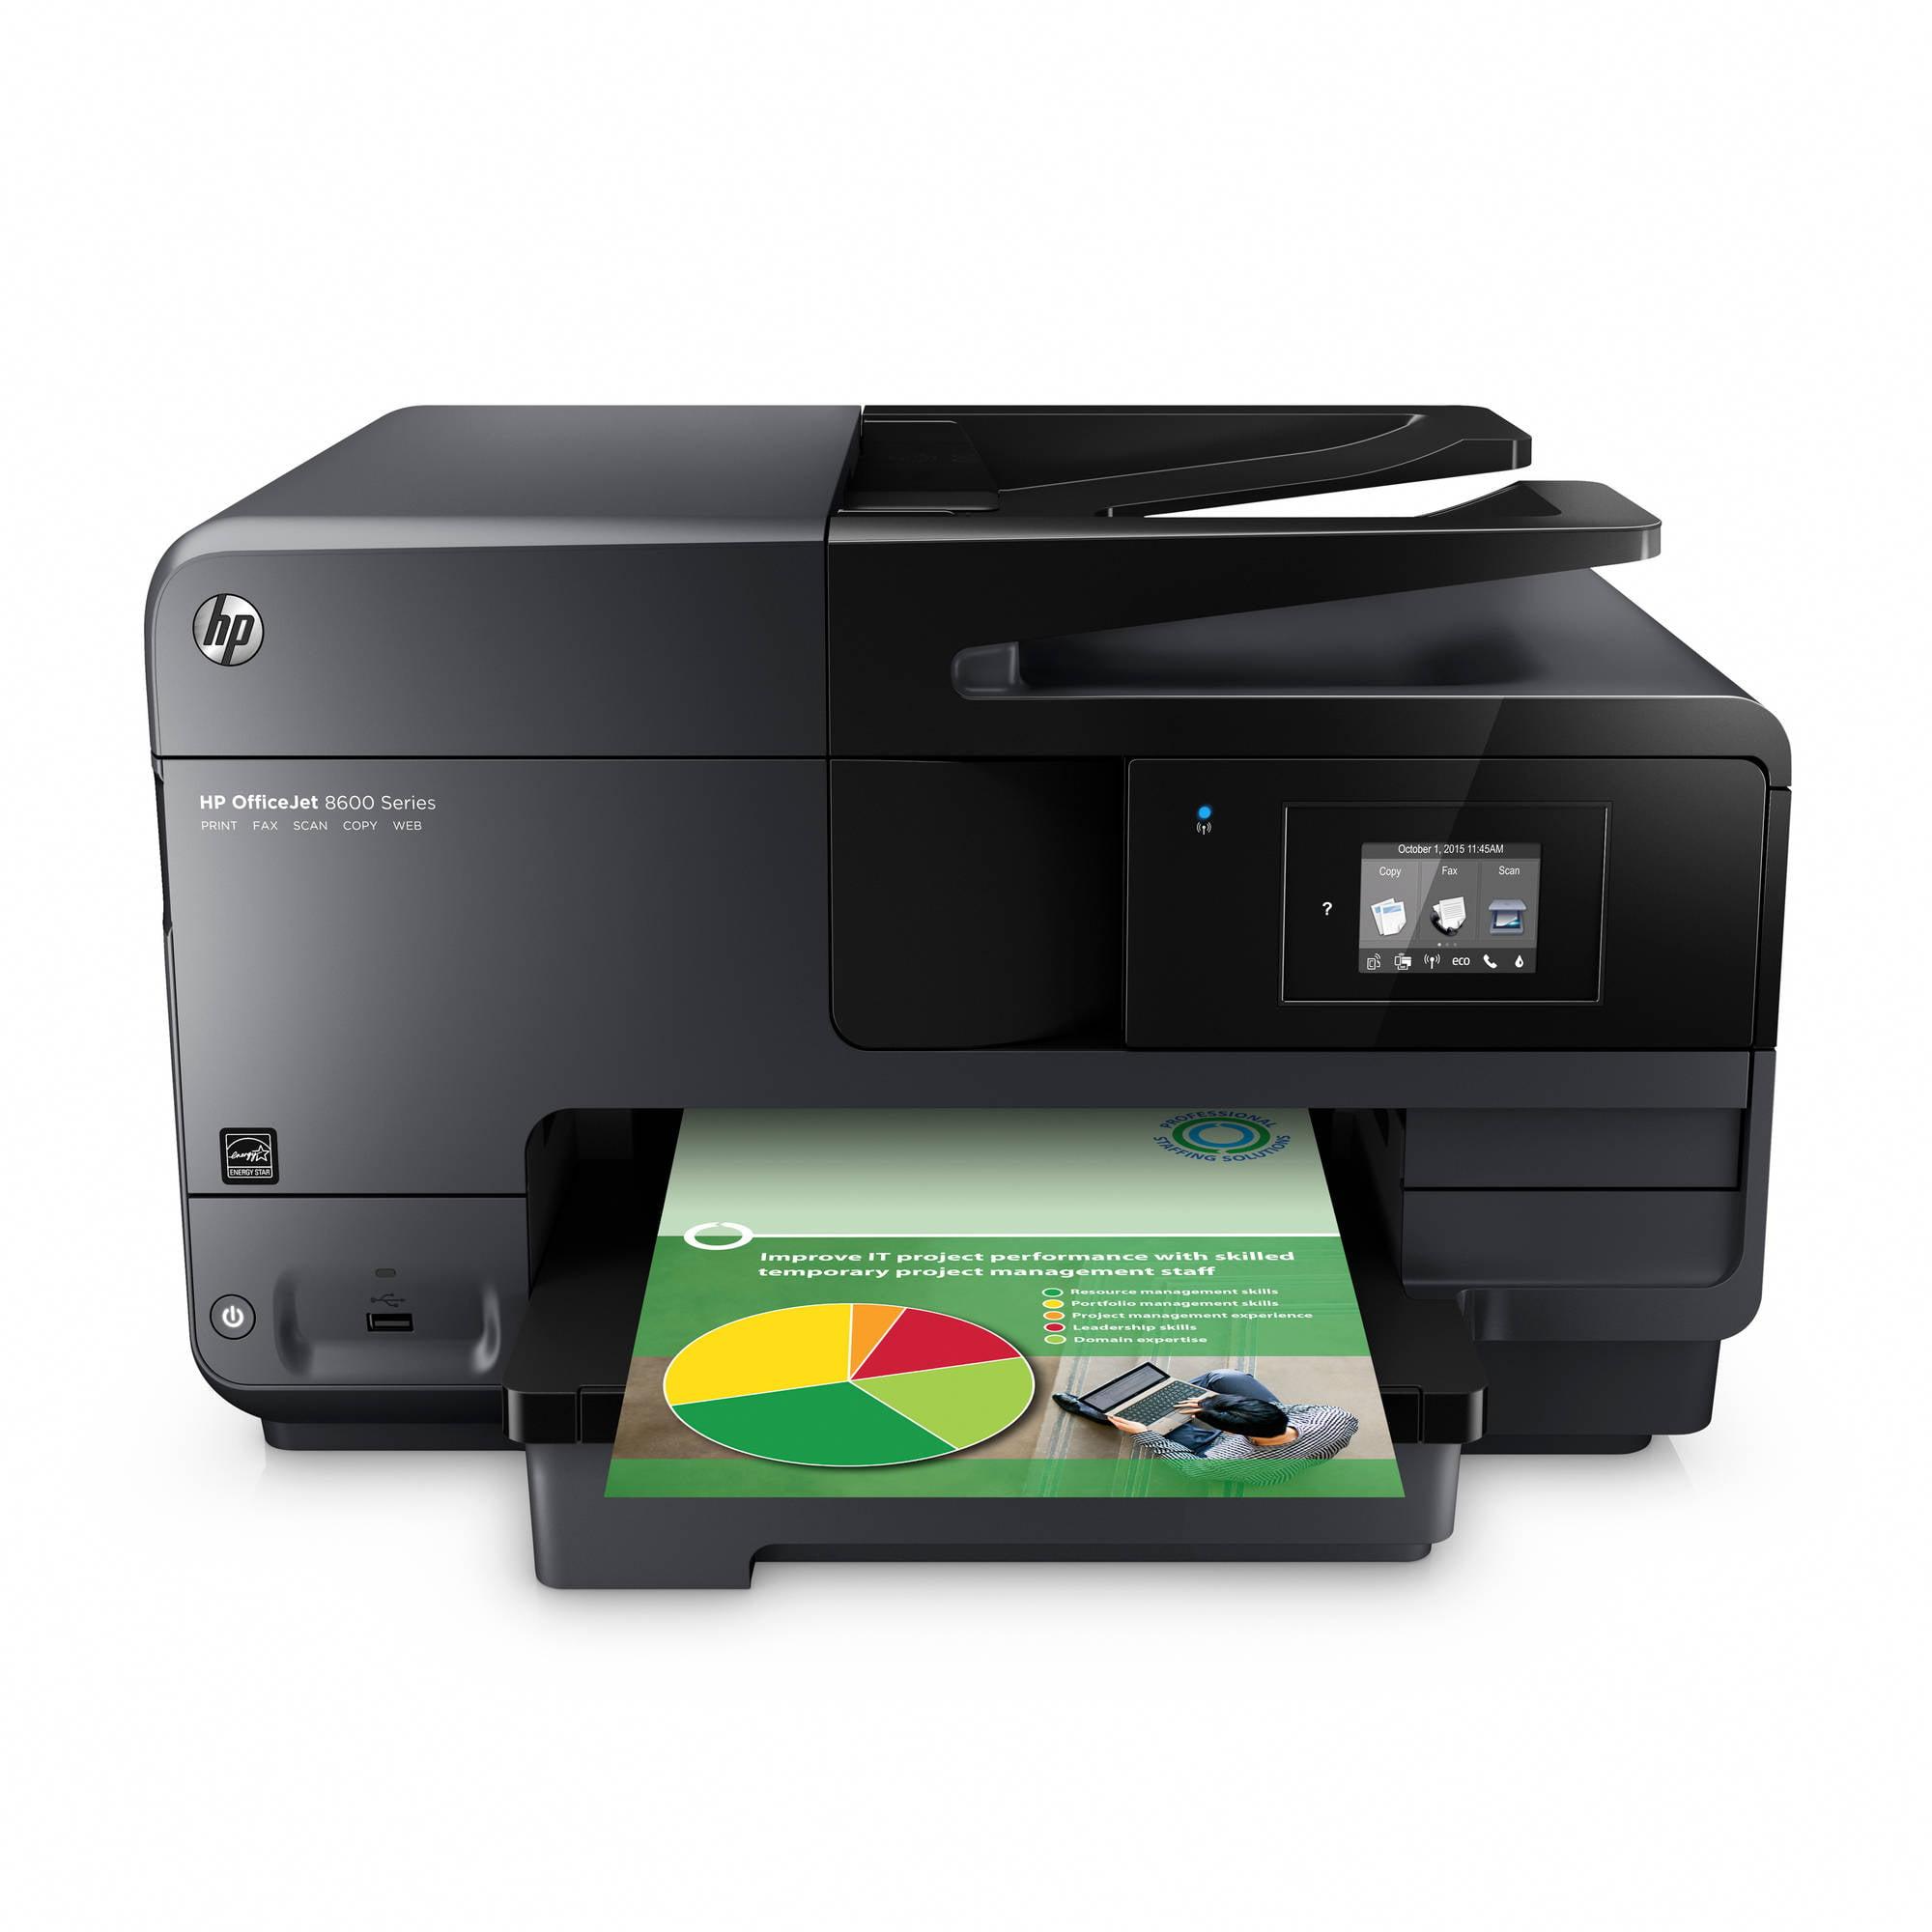 HP OfficeJet 8600 Inkjet e-All-in-One Multifunction Printer Copier Scanner Fax Machine by HP